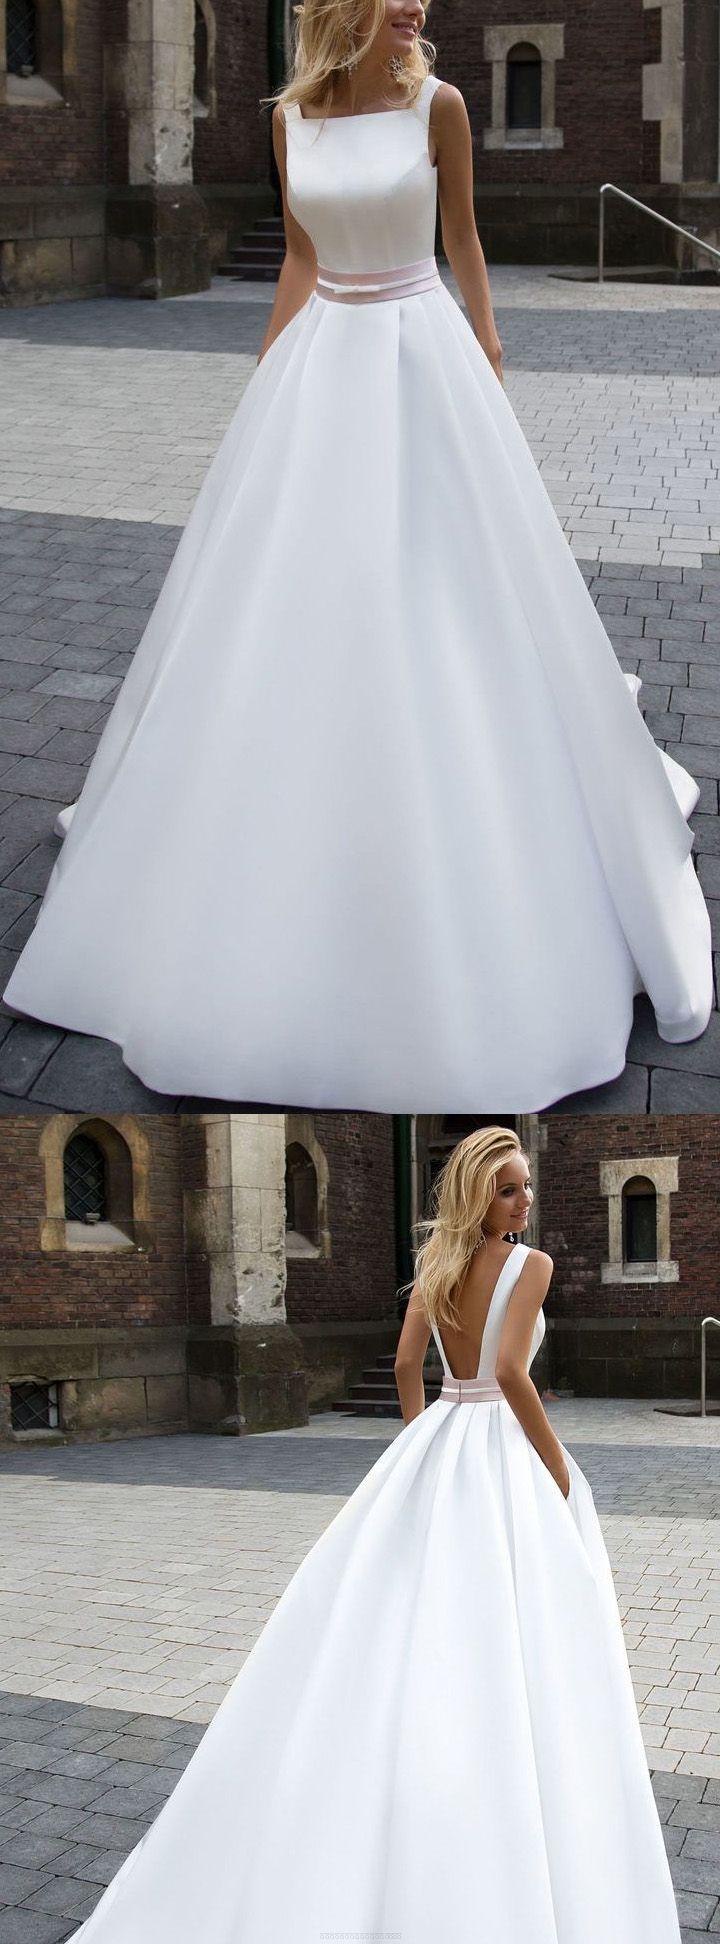 Wedding dresses simple bridal wedding dresses satin wedding